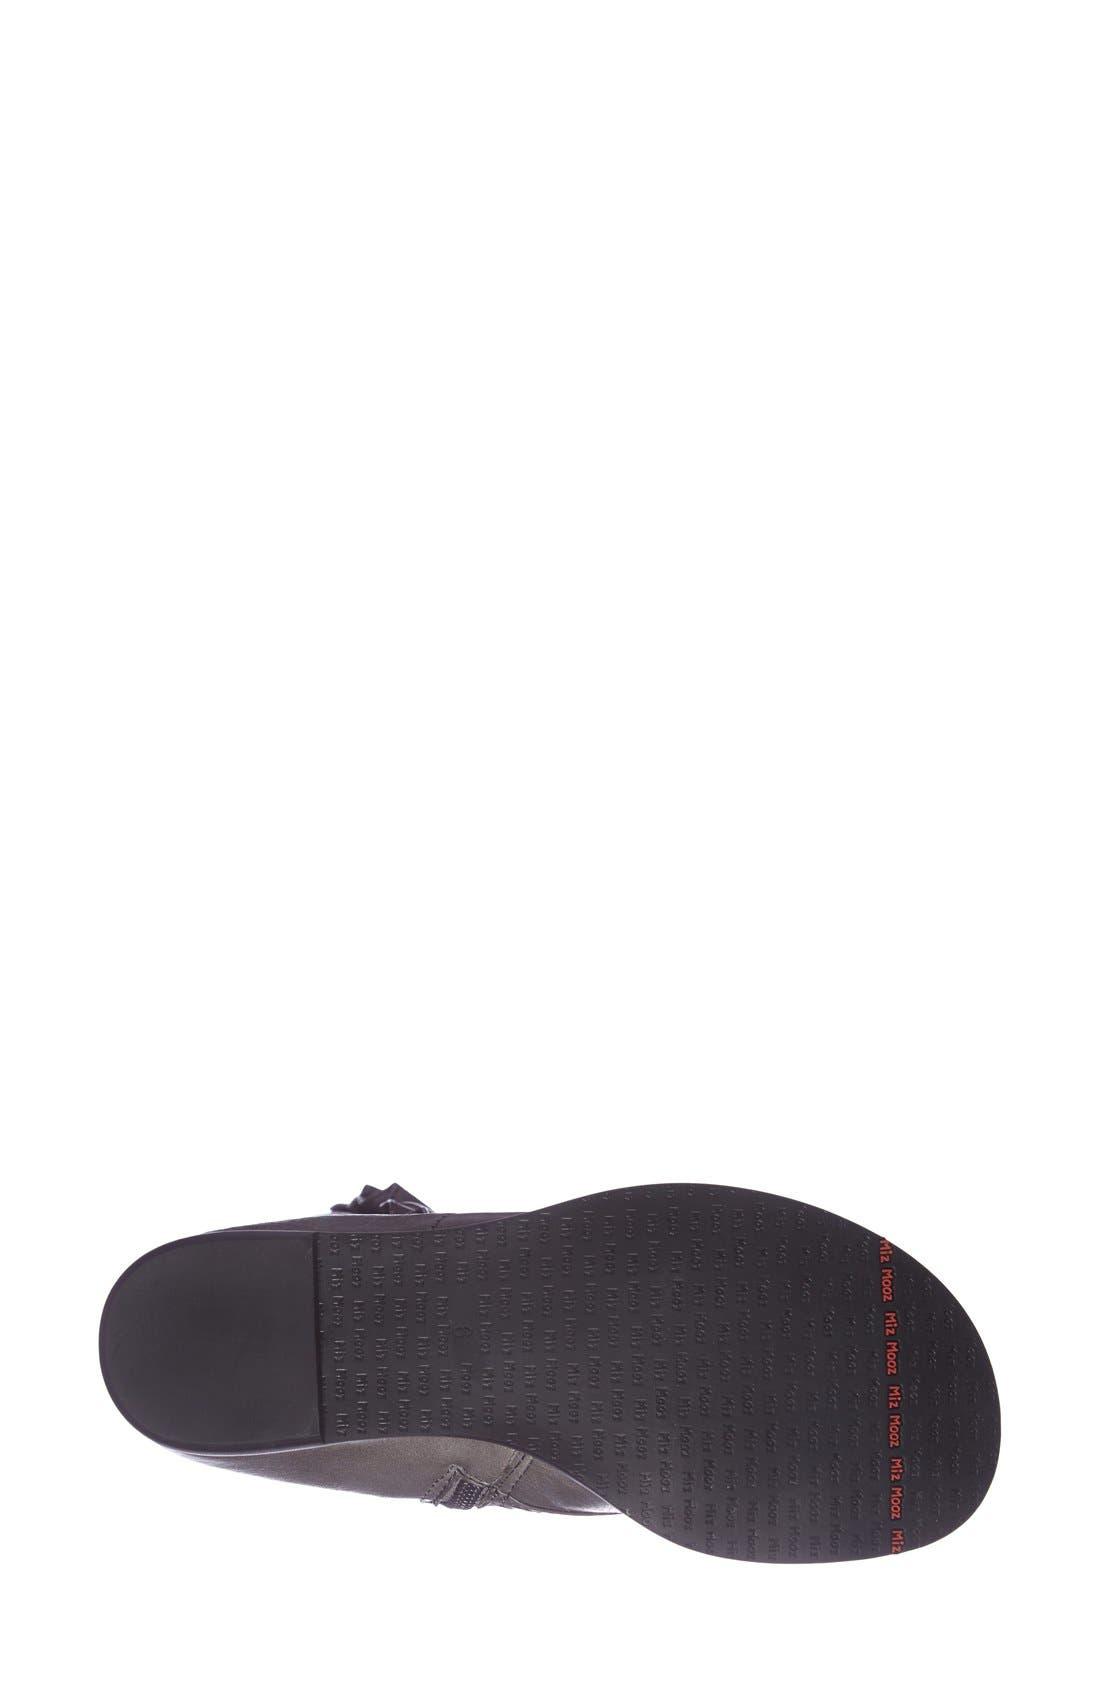 Alternate Image 4  - Miz Mooz 'Bloom' Leather Boot (Women)(Wide Calf)